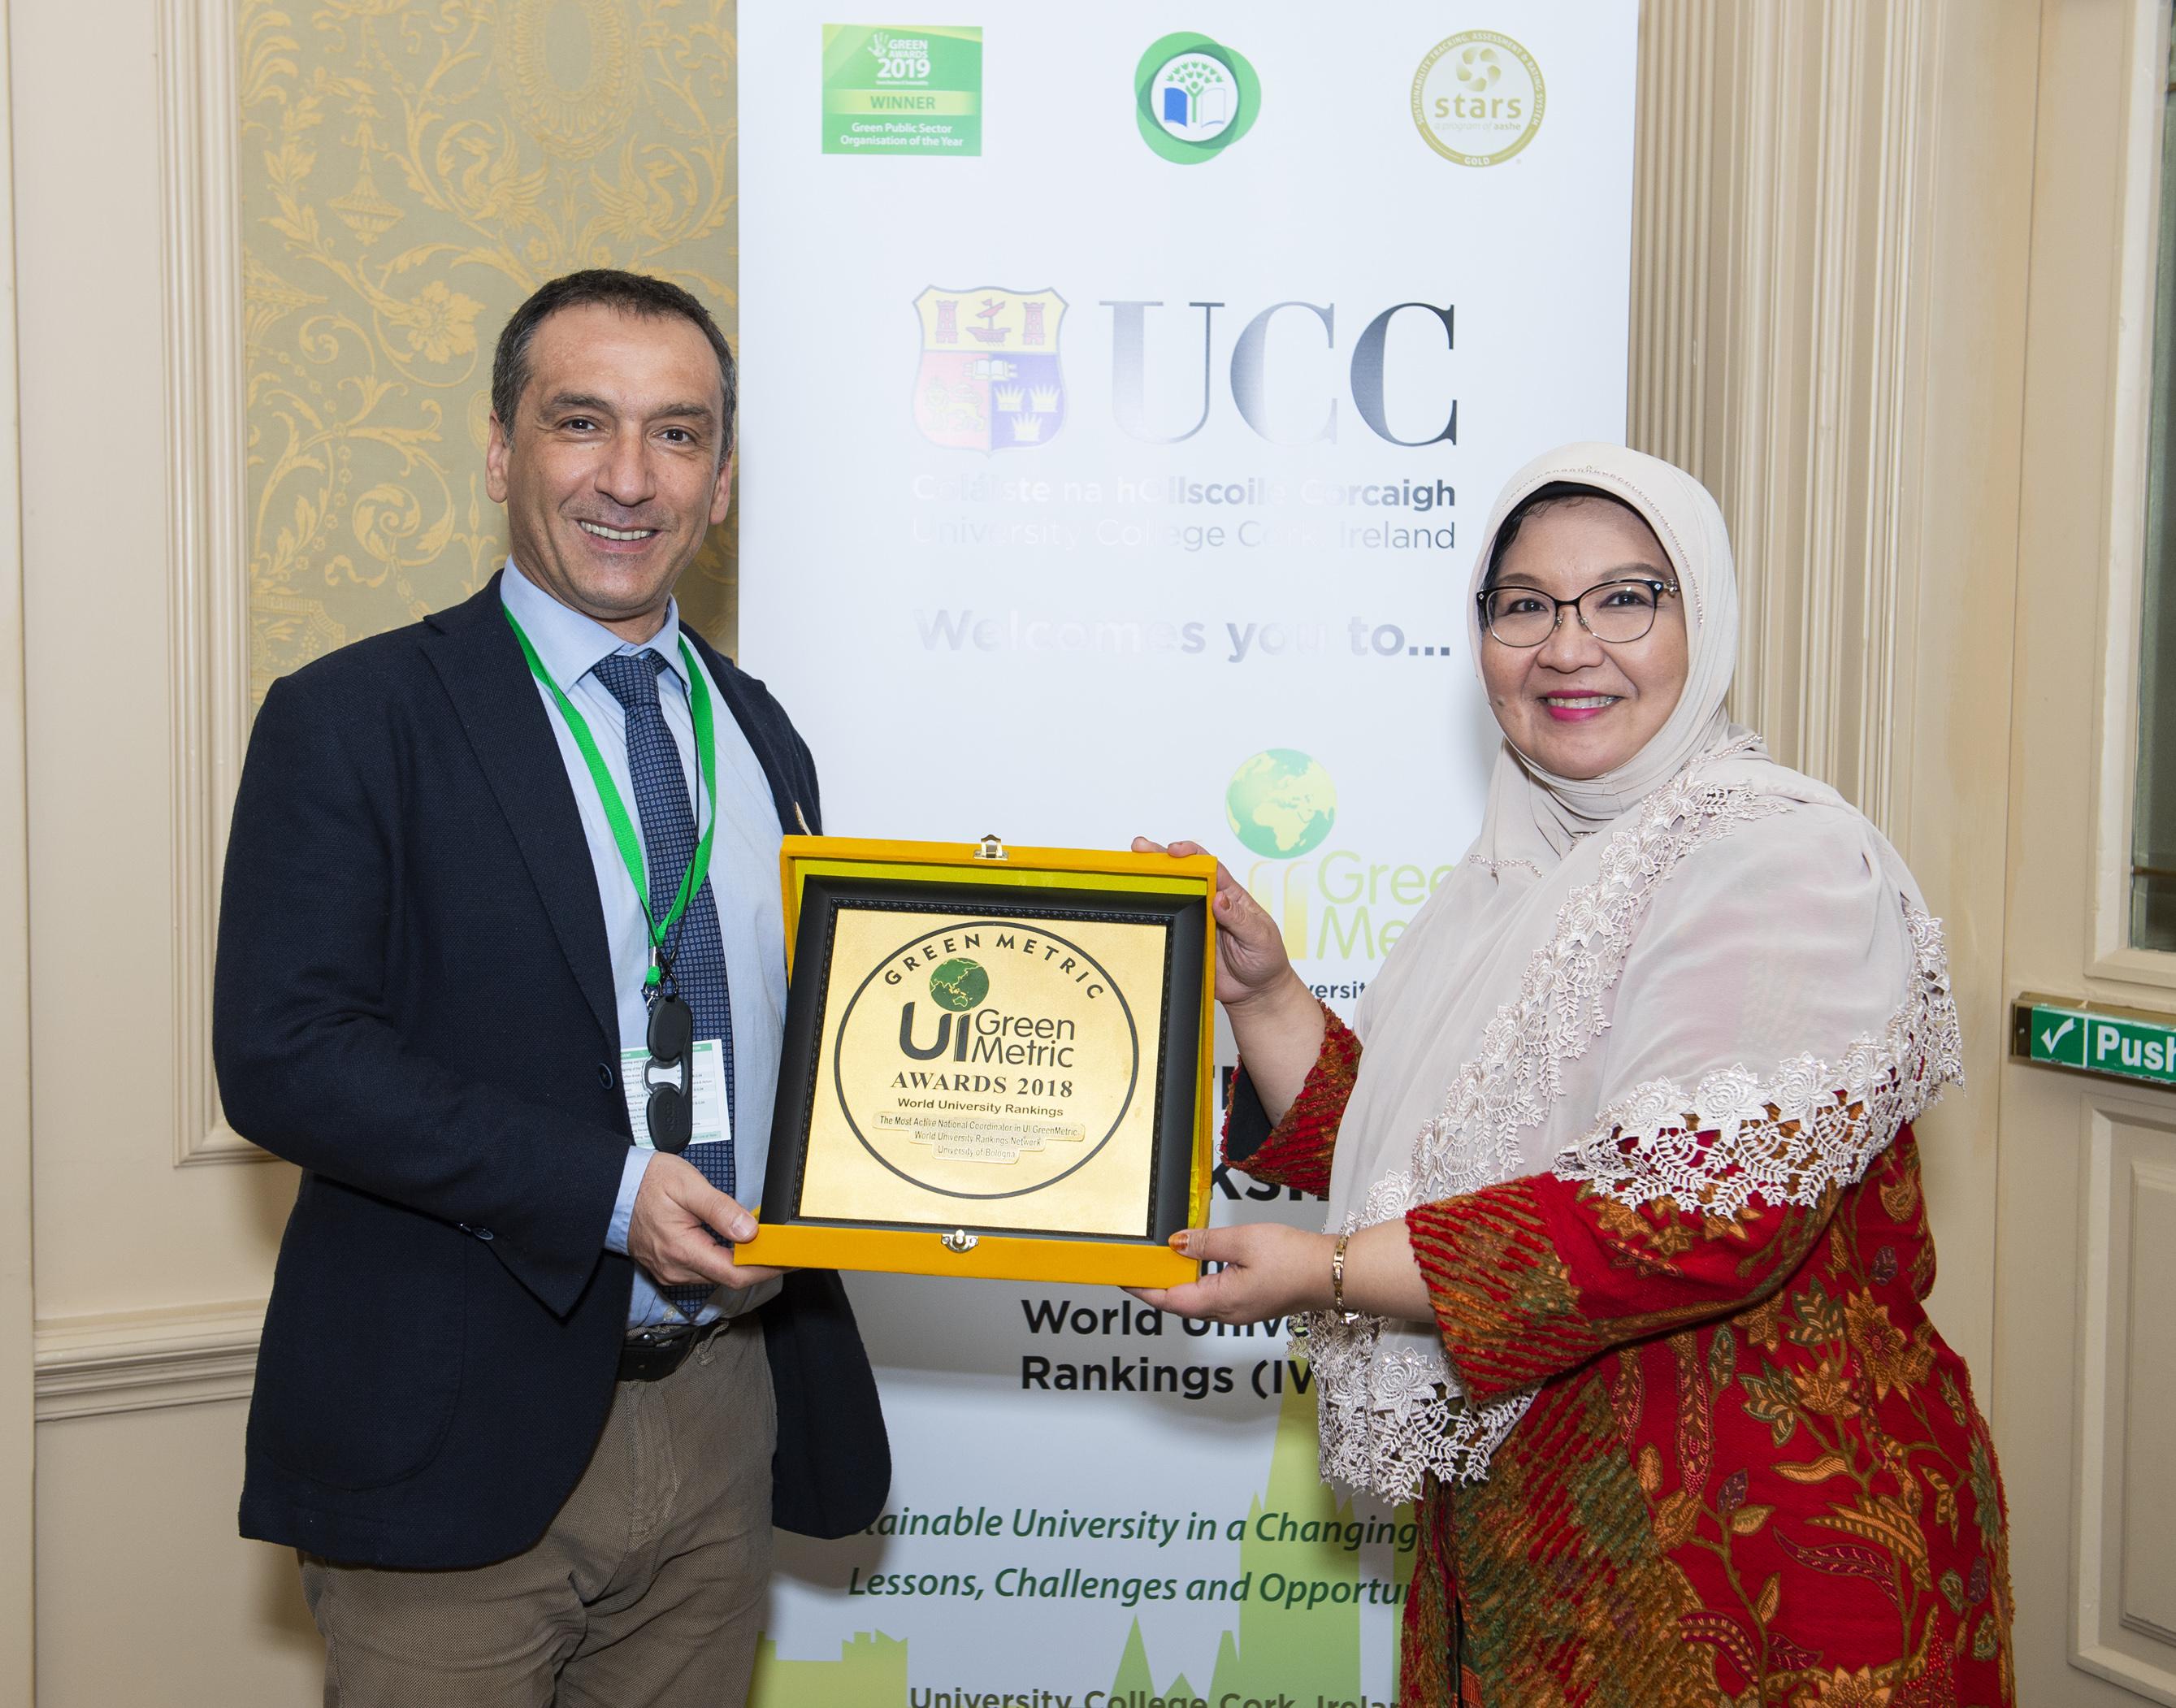 UI GreenMetric World University Rankings.jpg